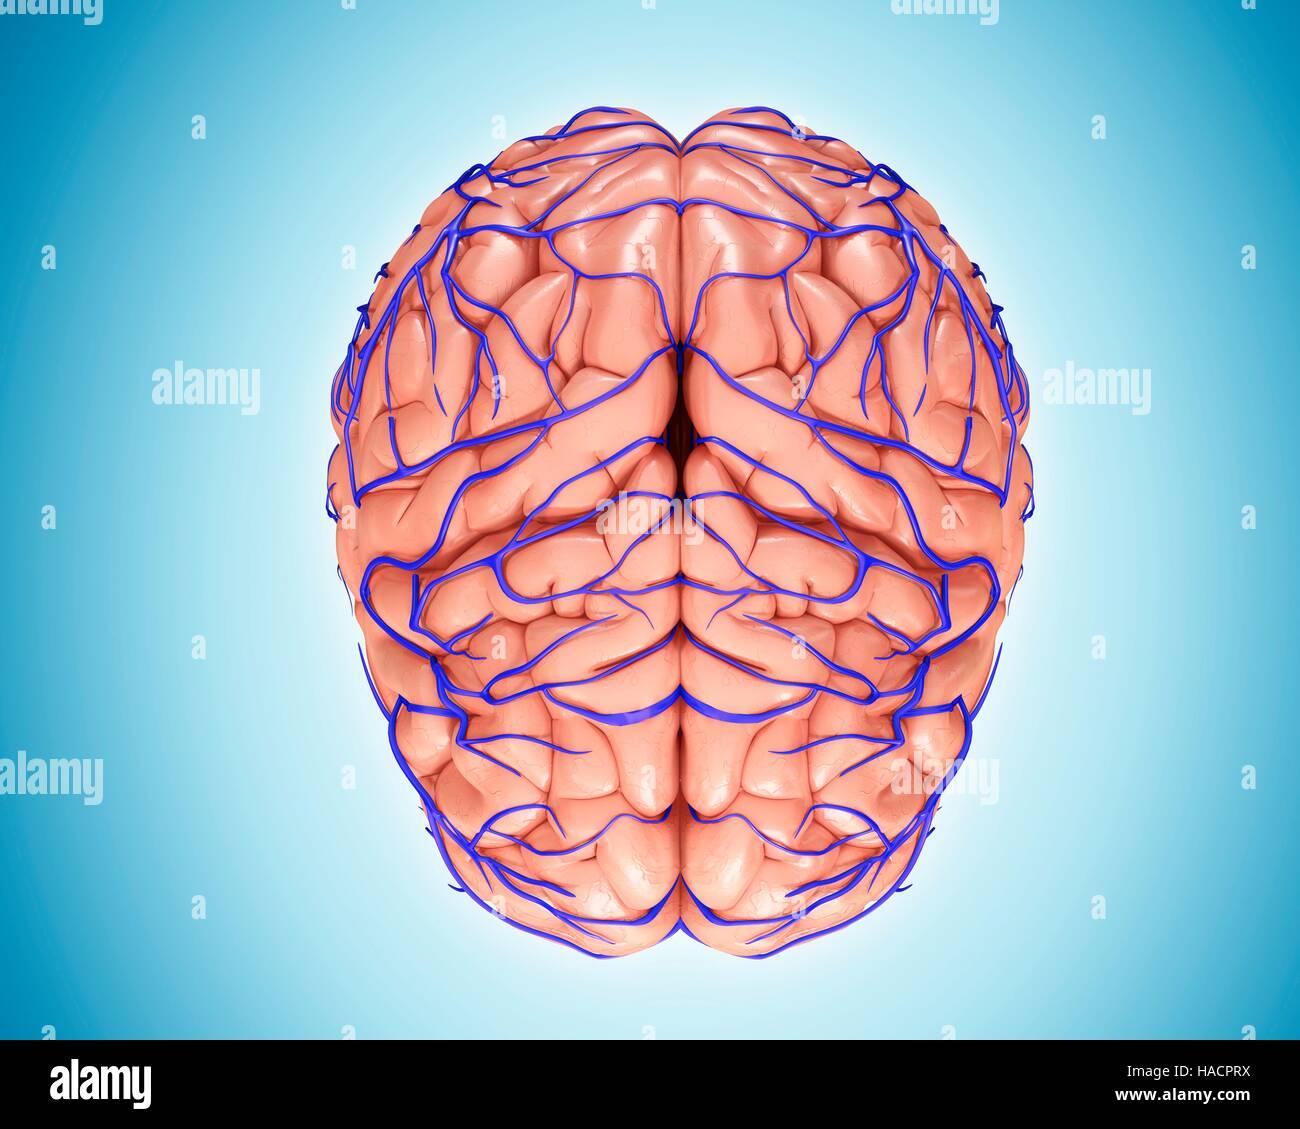 Illustration of brain veins and anatomy Stock Photo: 126900478 - Alamy